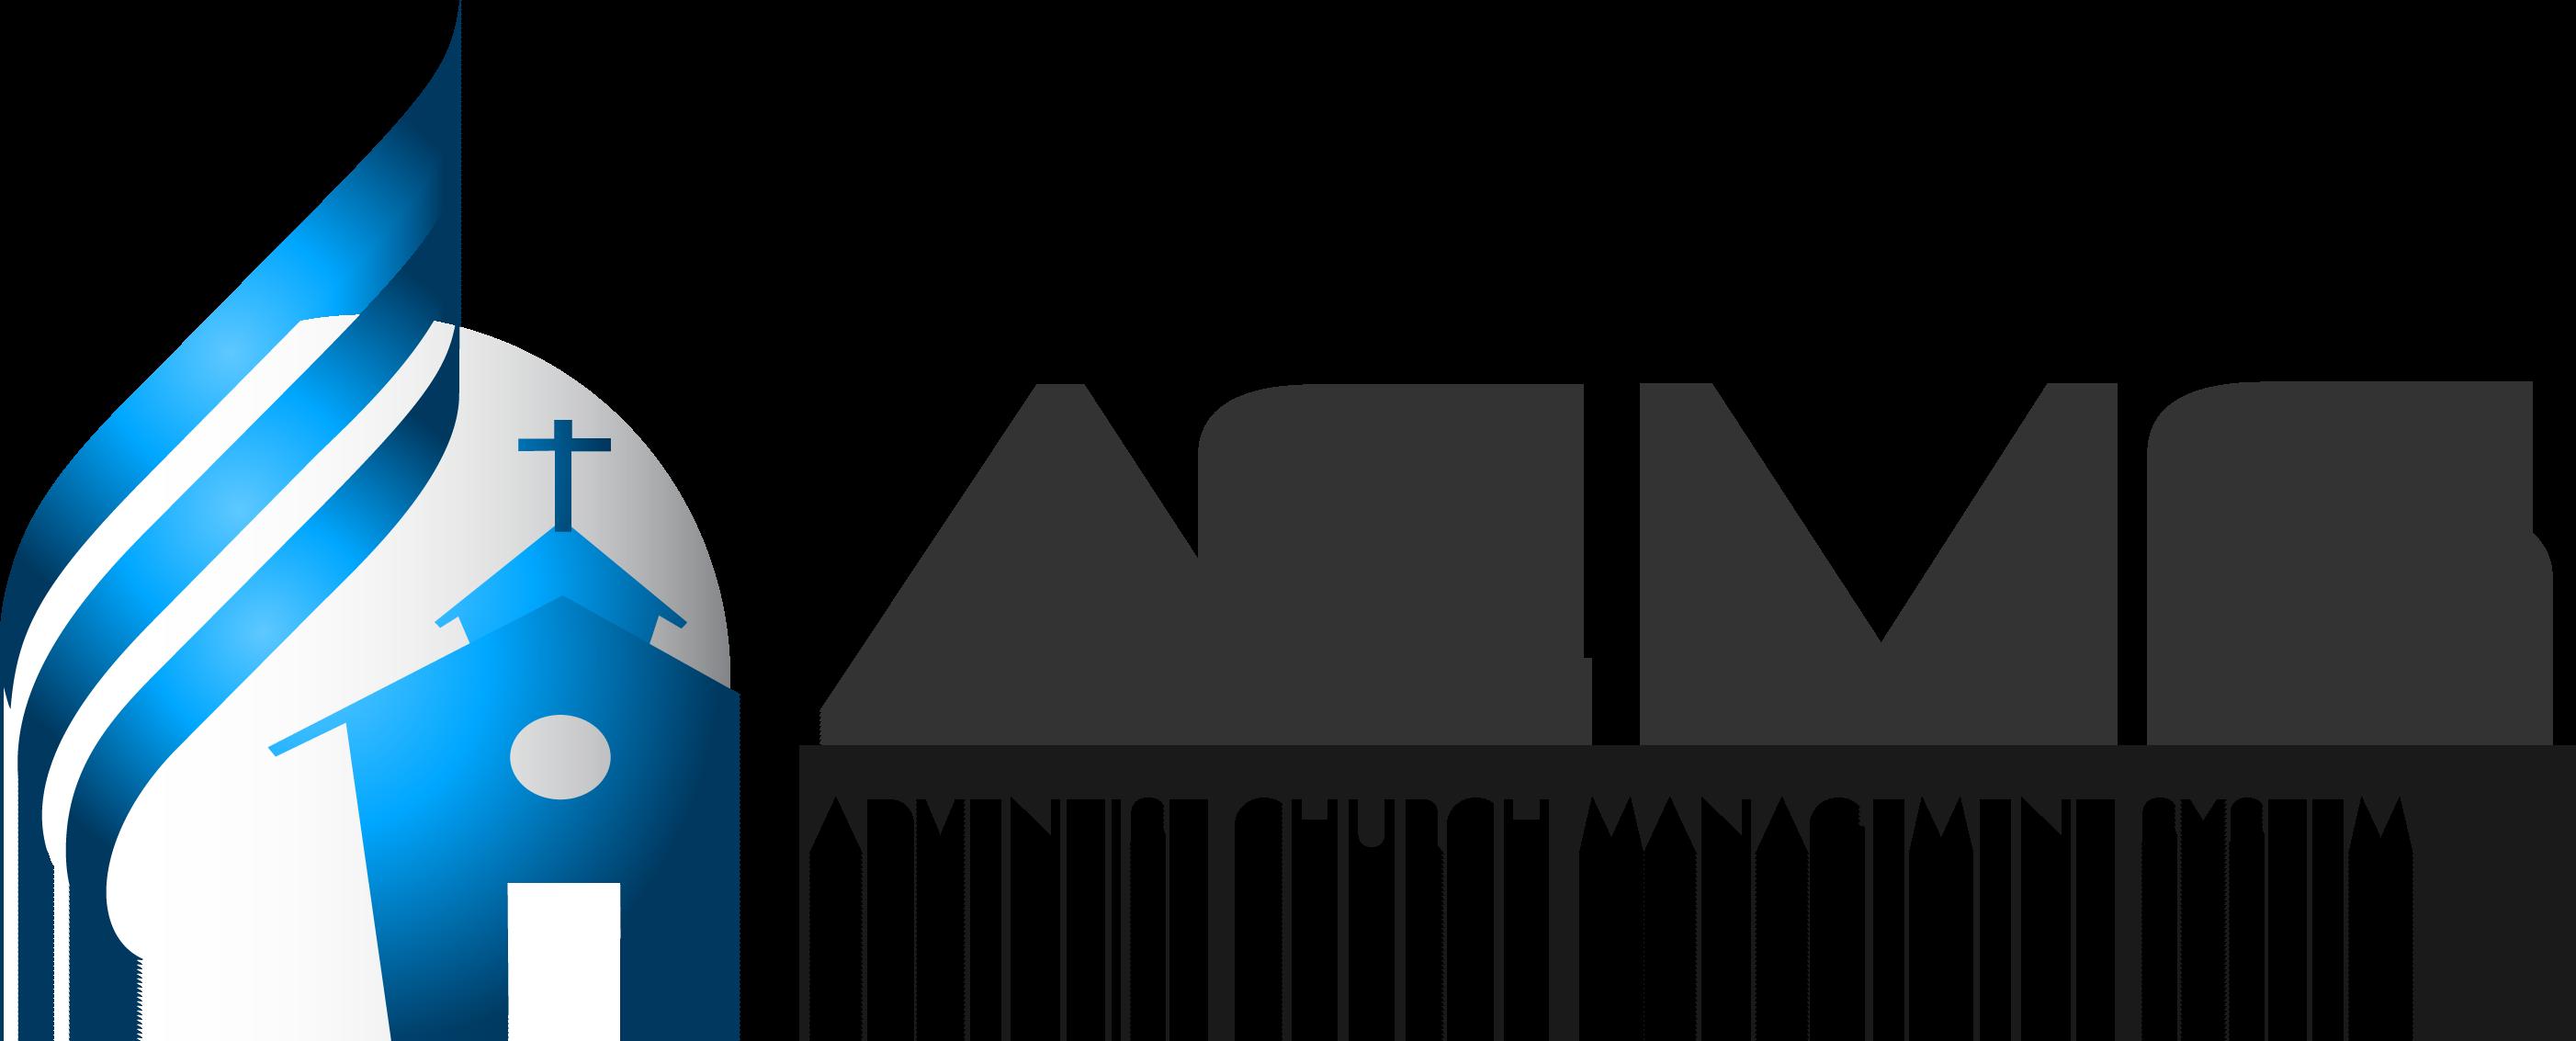 ACMS - New 11